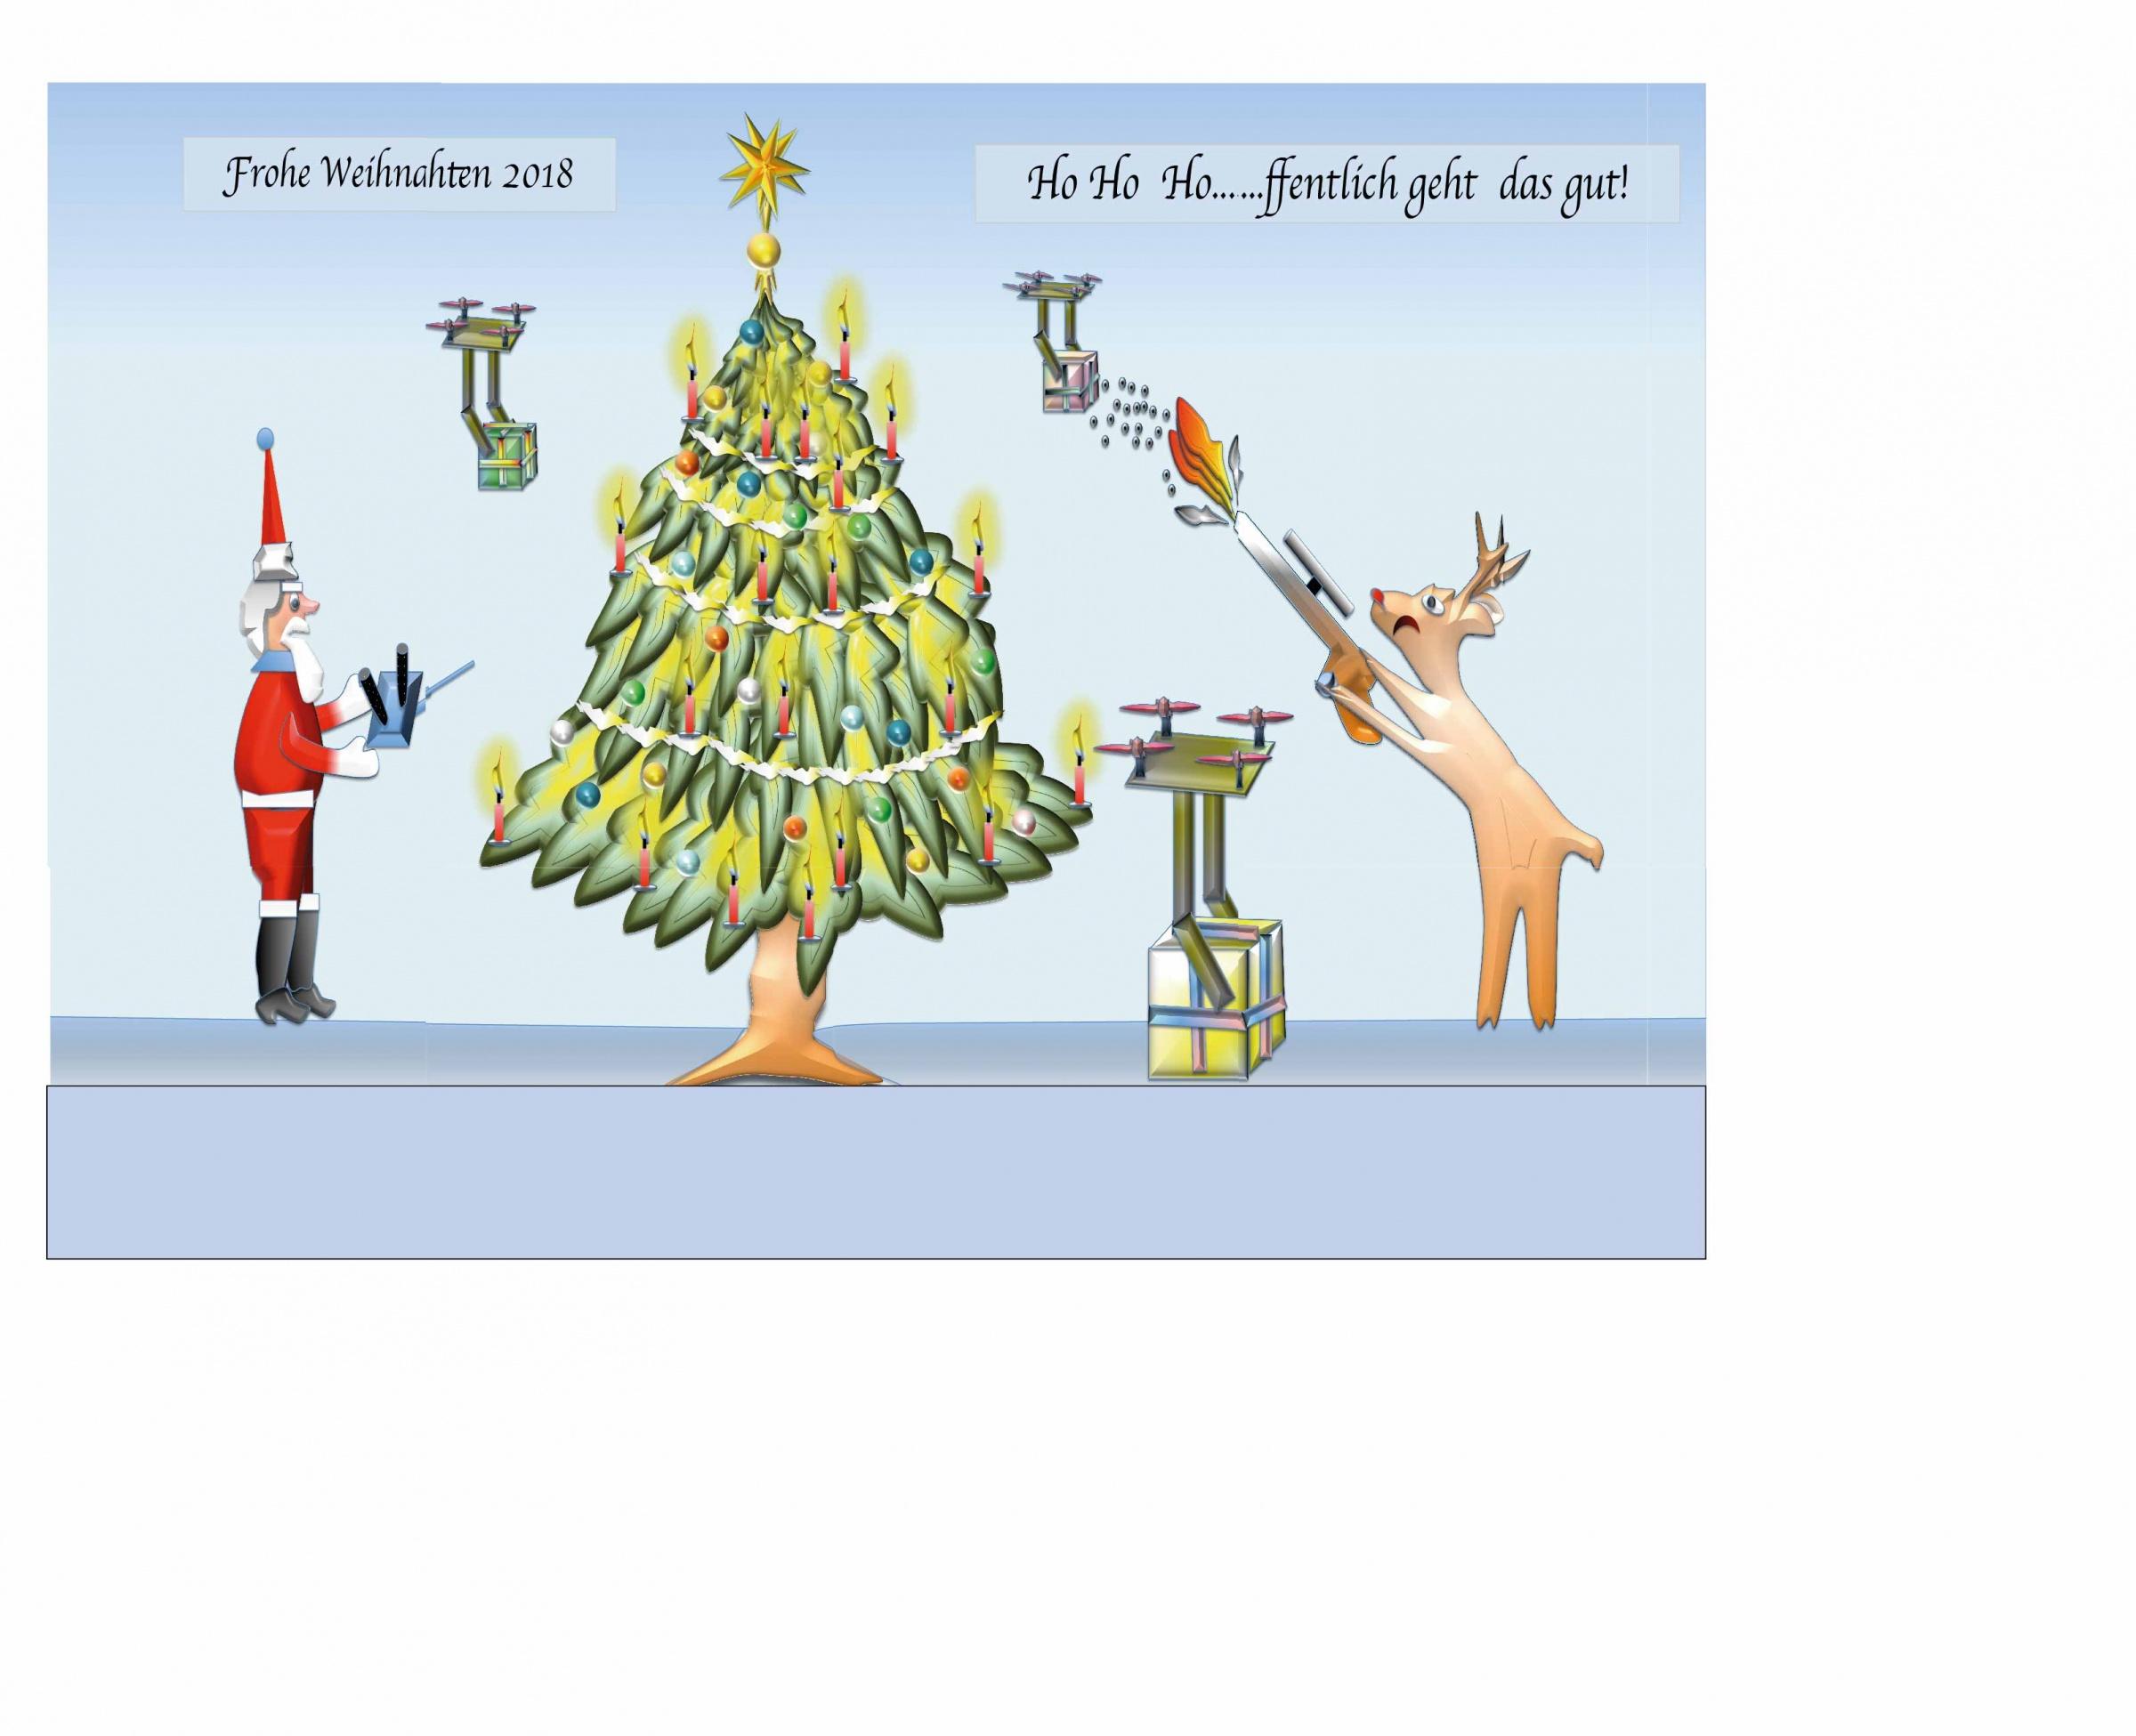 Frohe Weihnachten 3d.Frohe Weihnachten 2018 3d Ring De